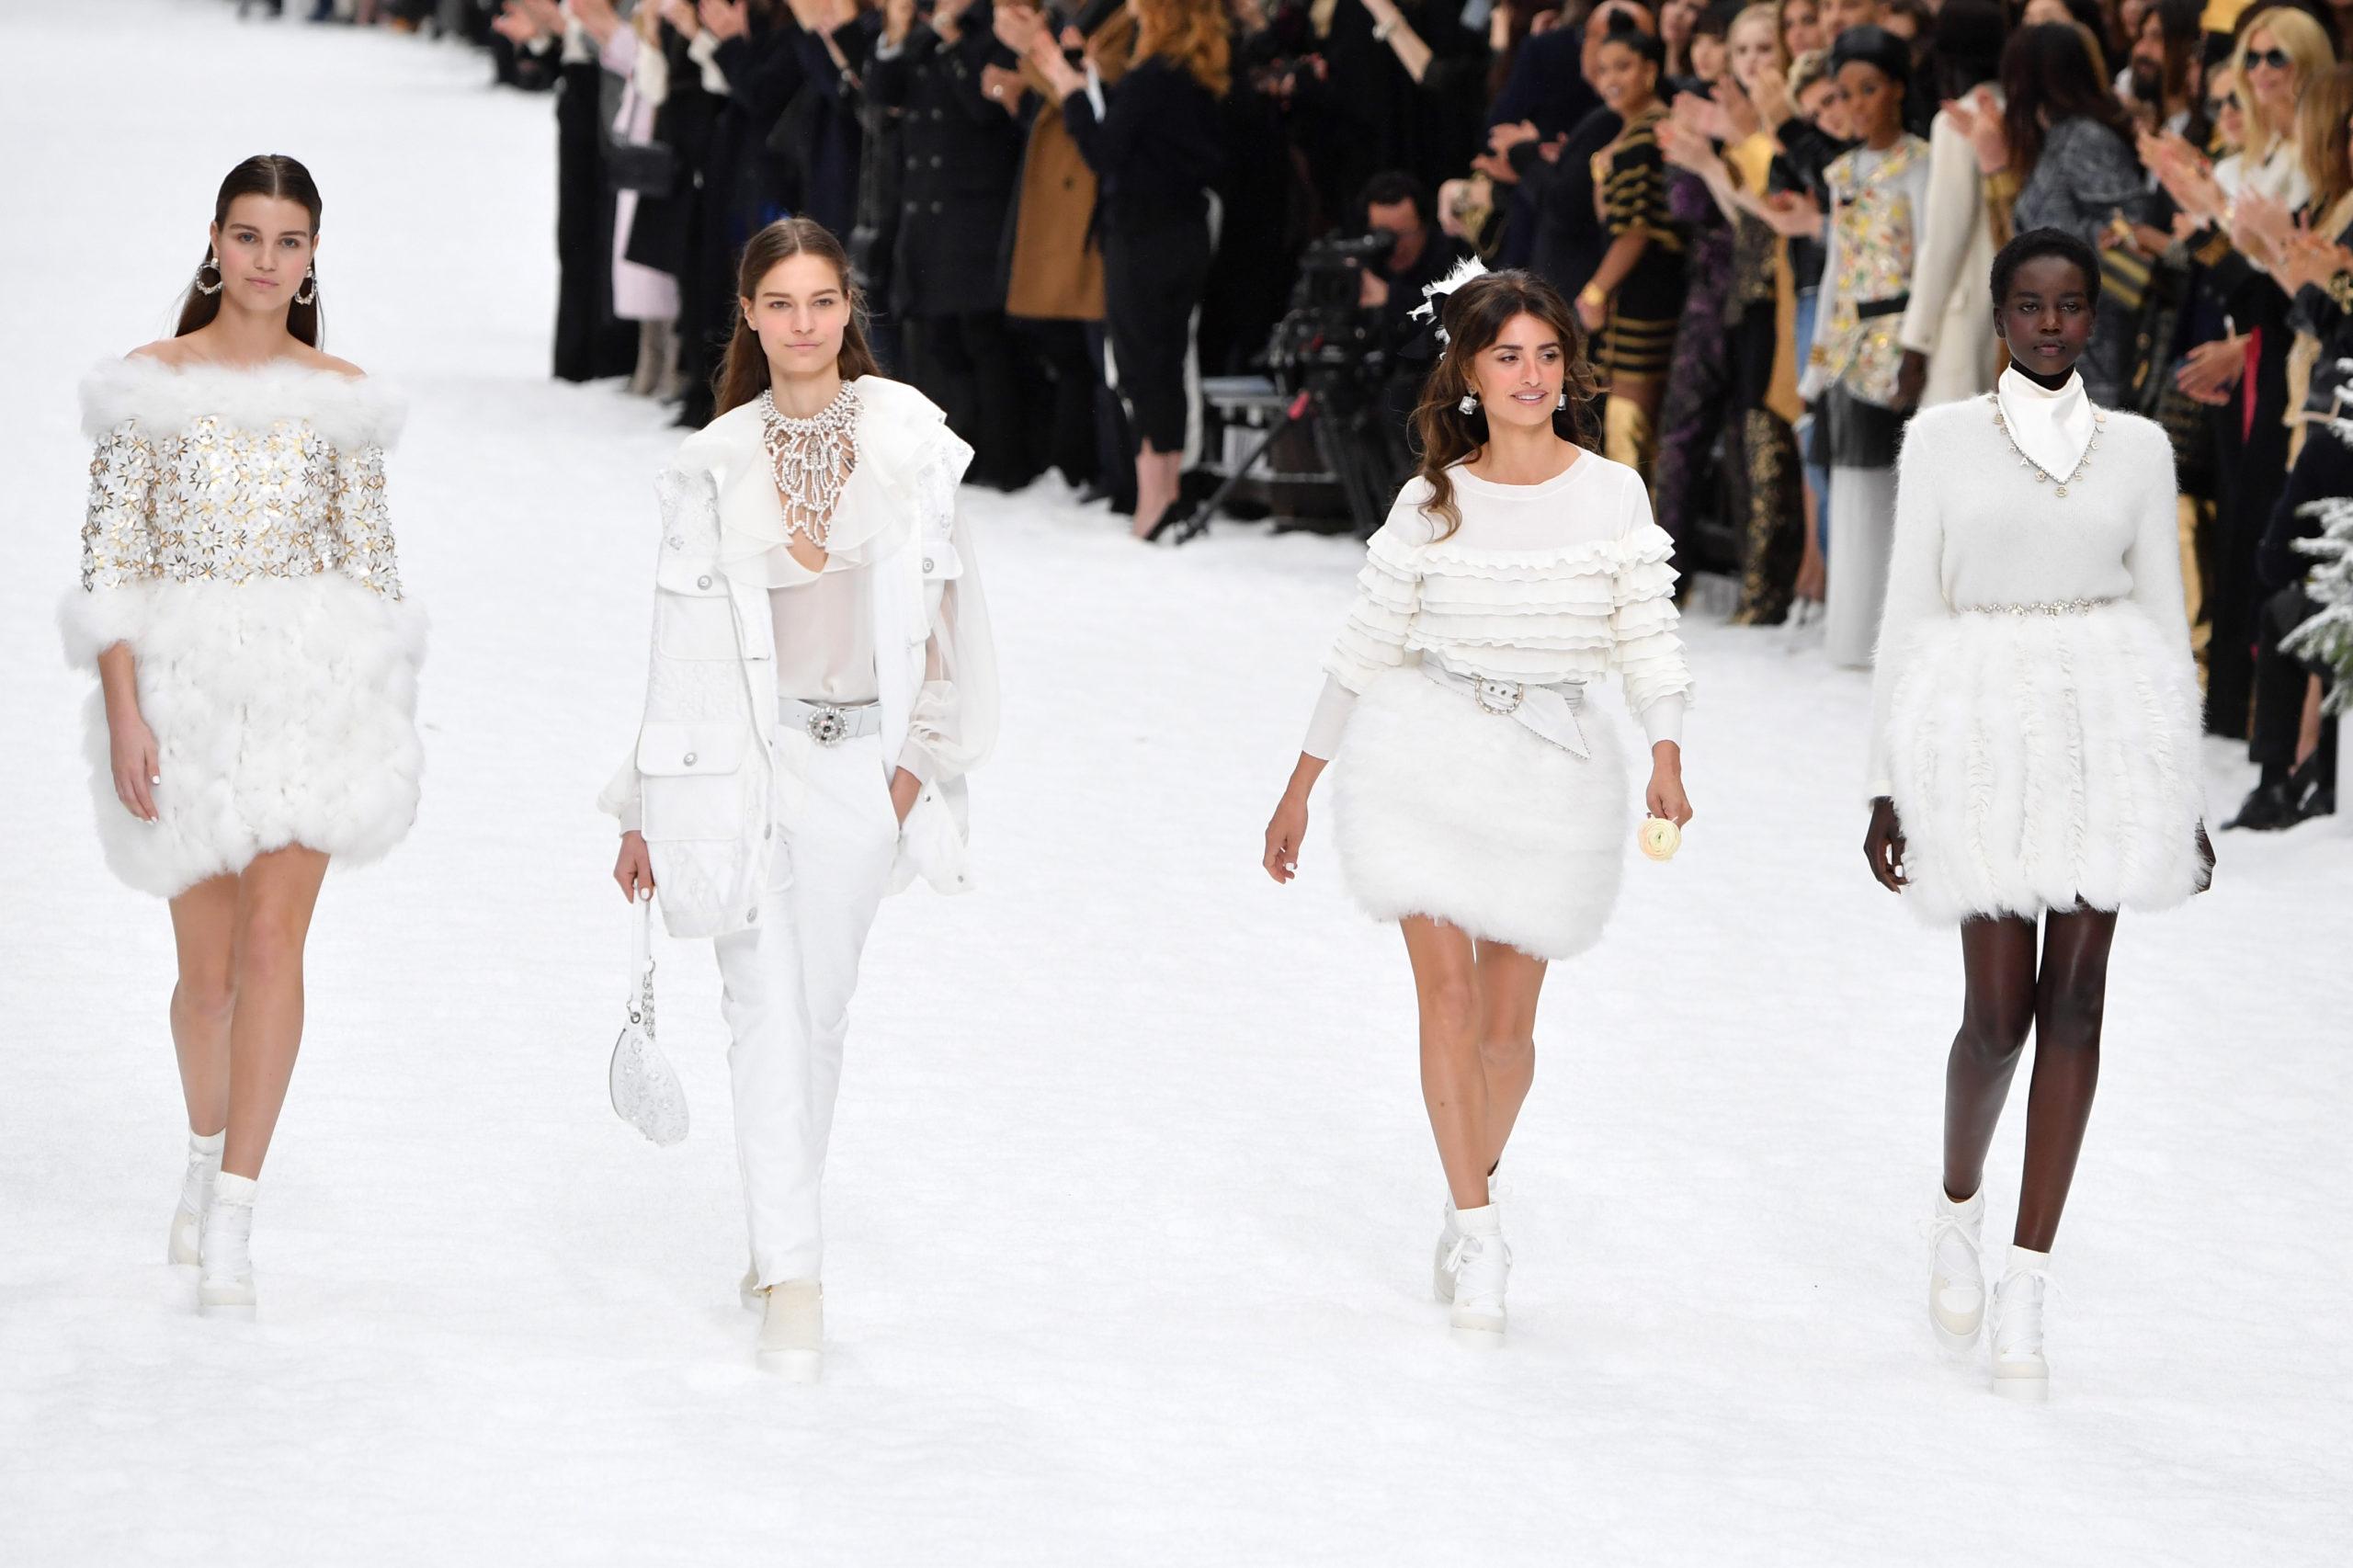 Penelope Cruz chiude la sfilata Chanel